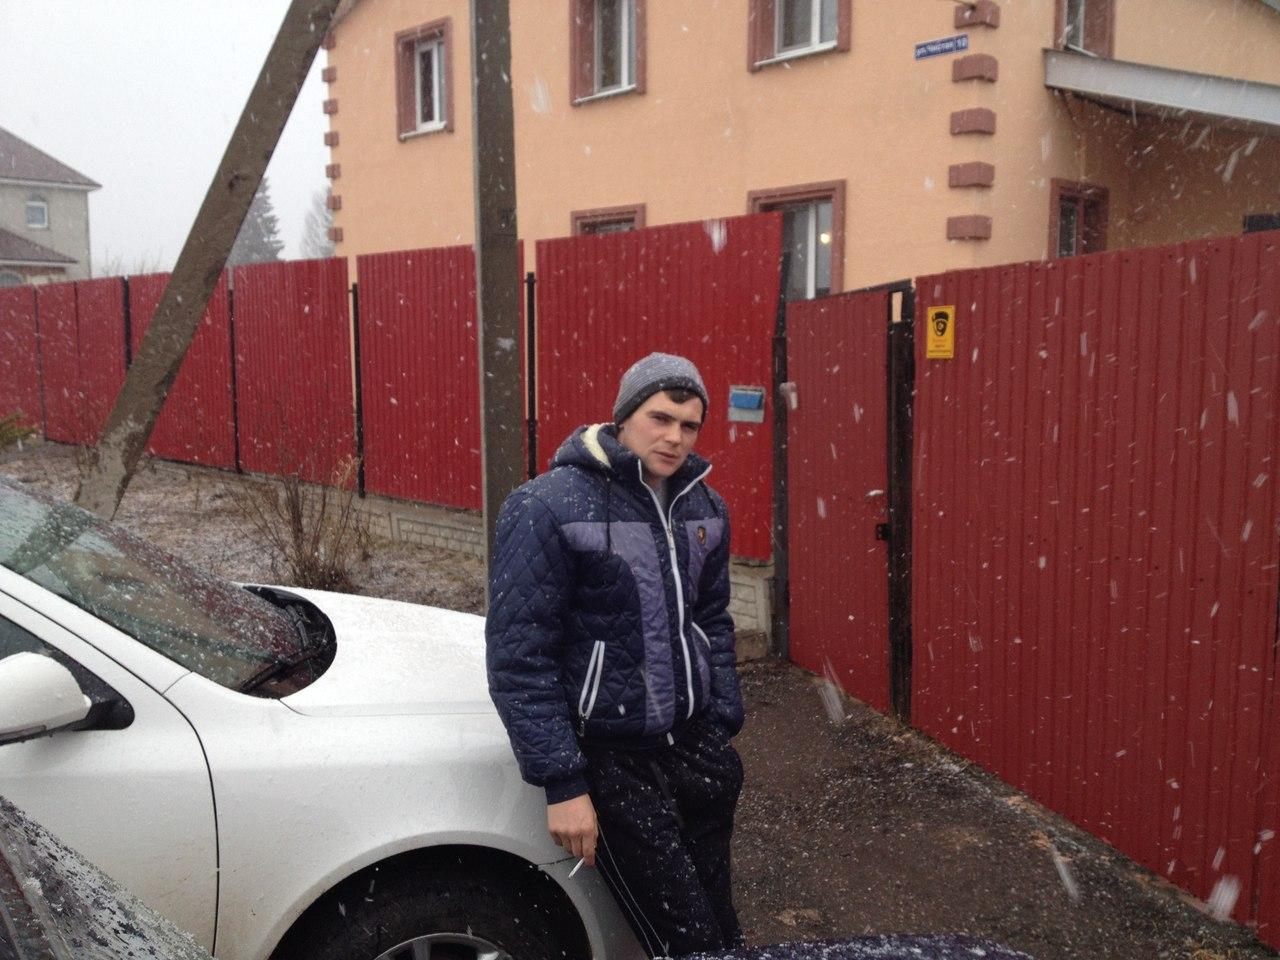 Олег Димитренко, Дивизия - фото №3